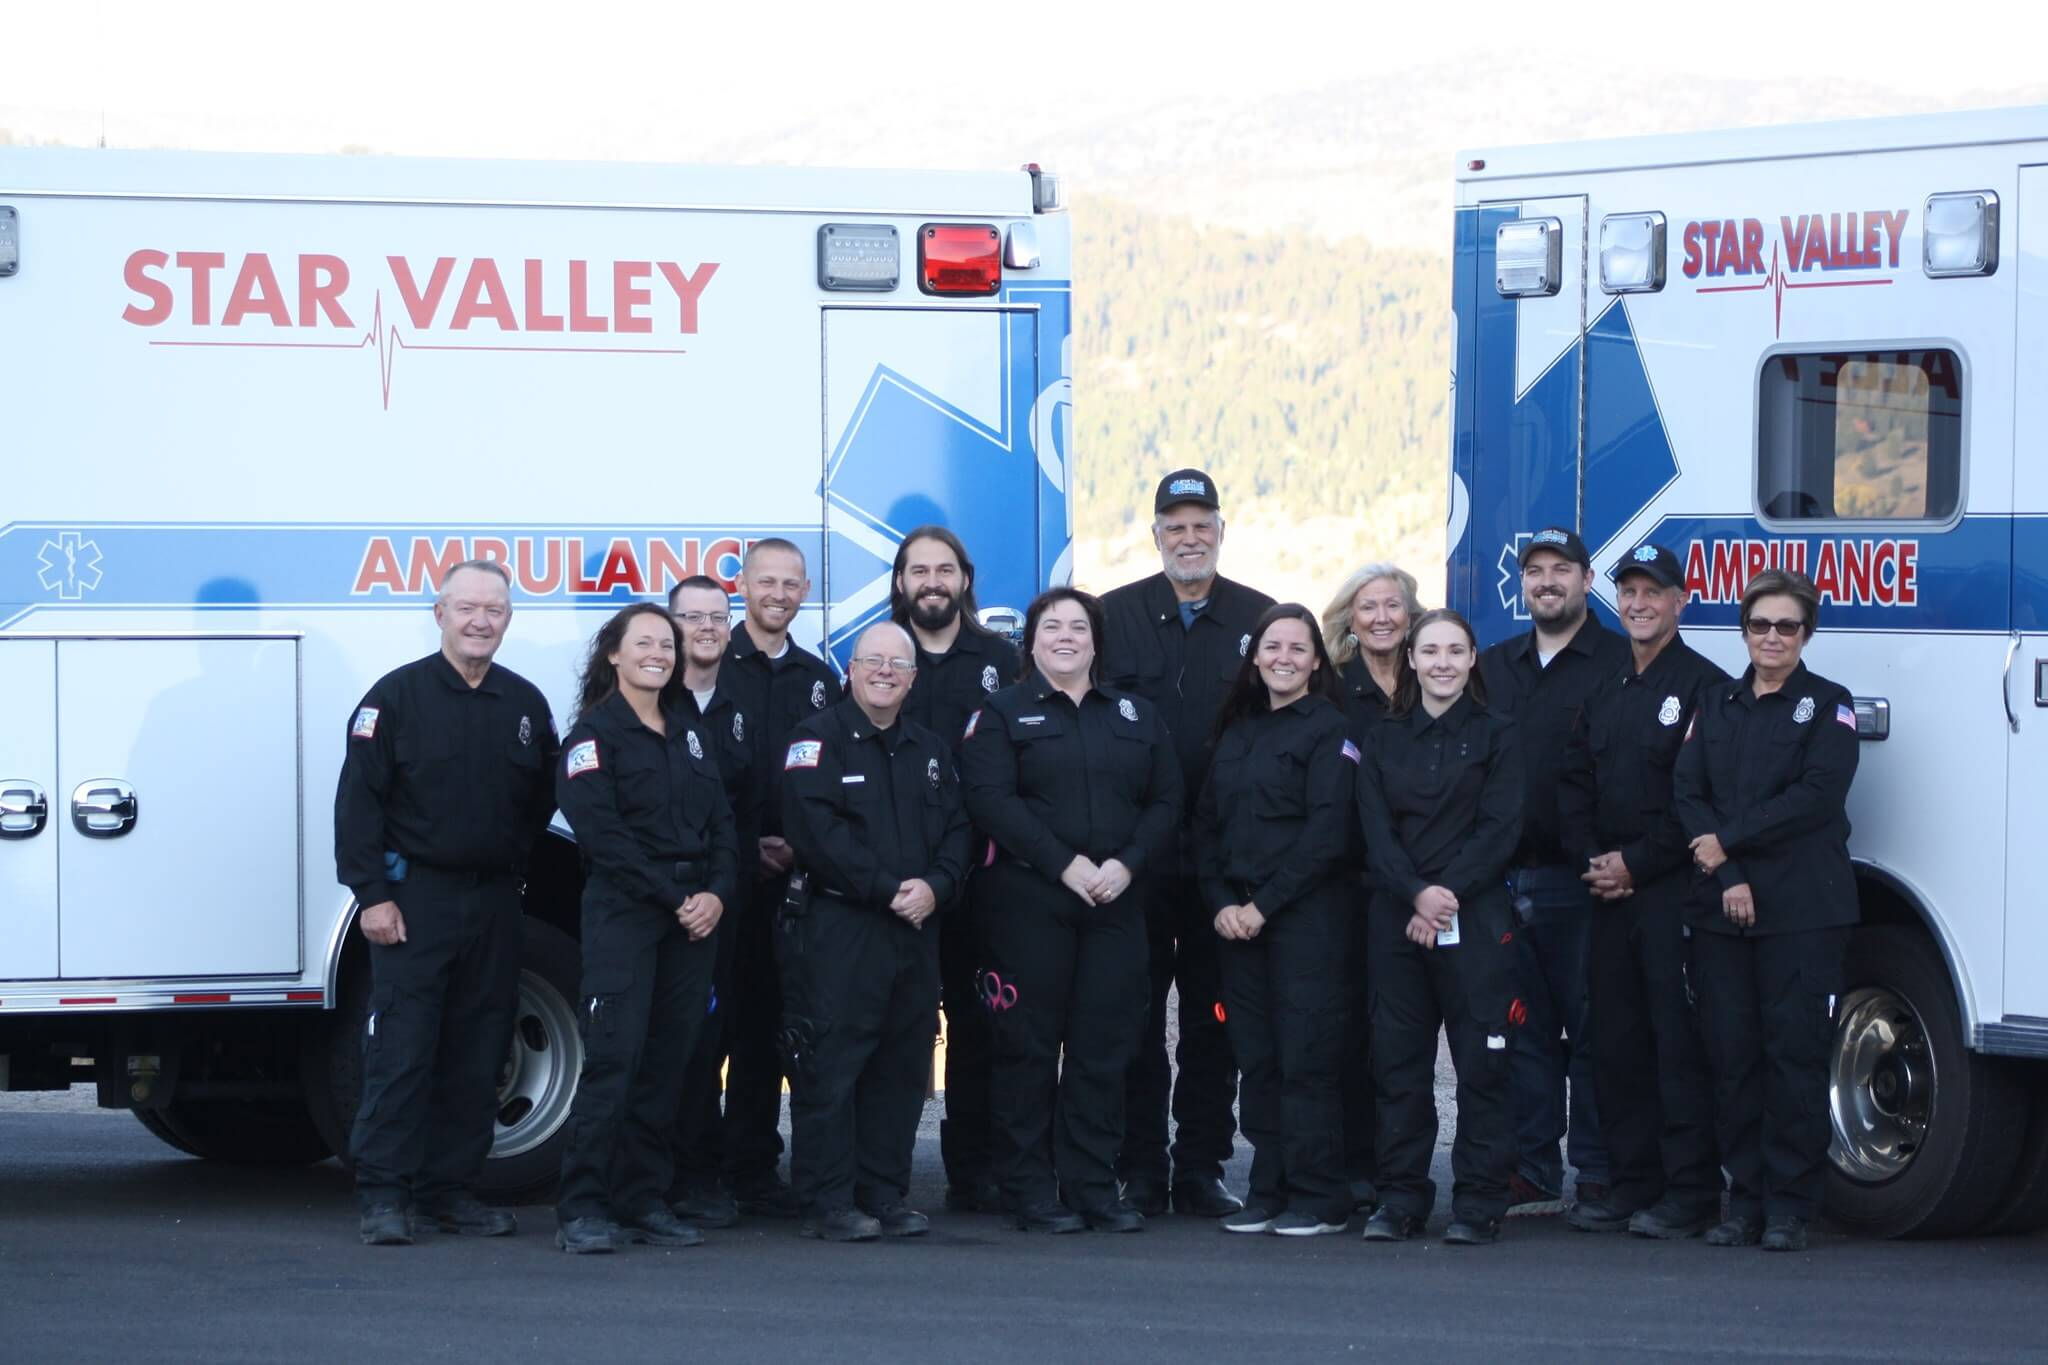 Star Valley EMS team